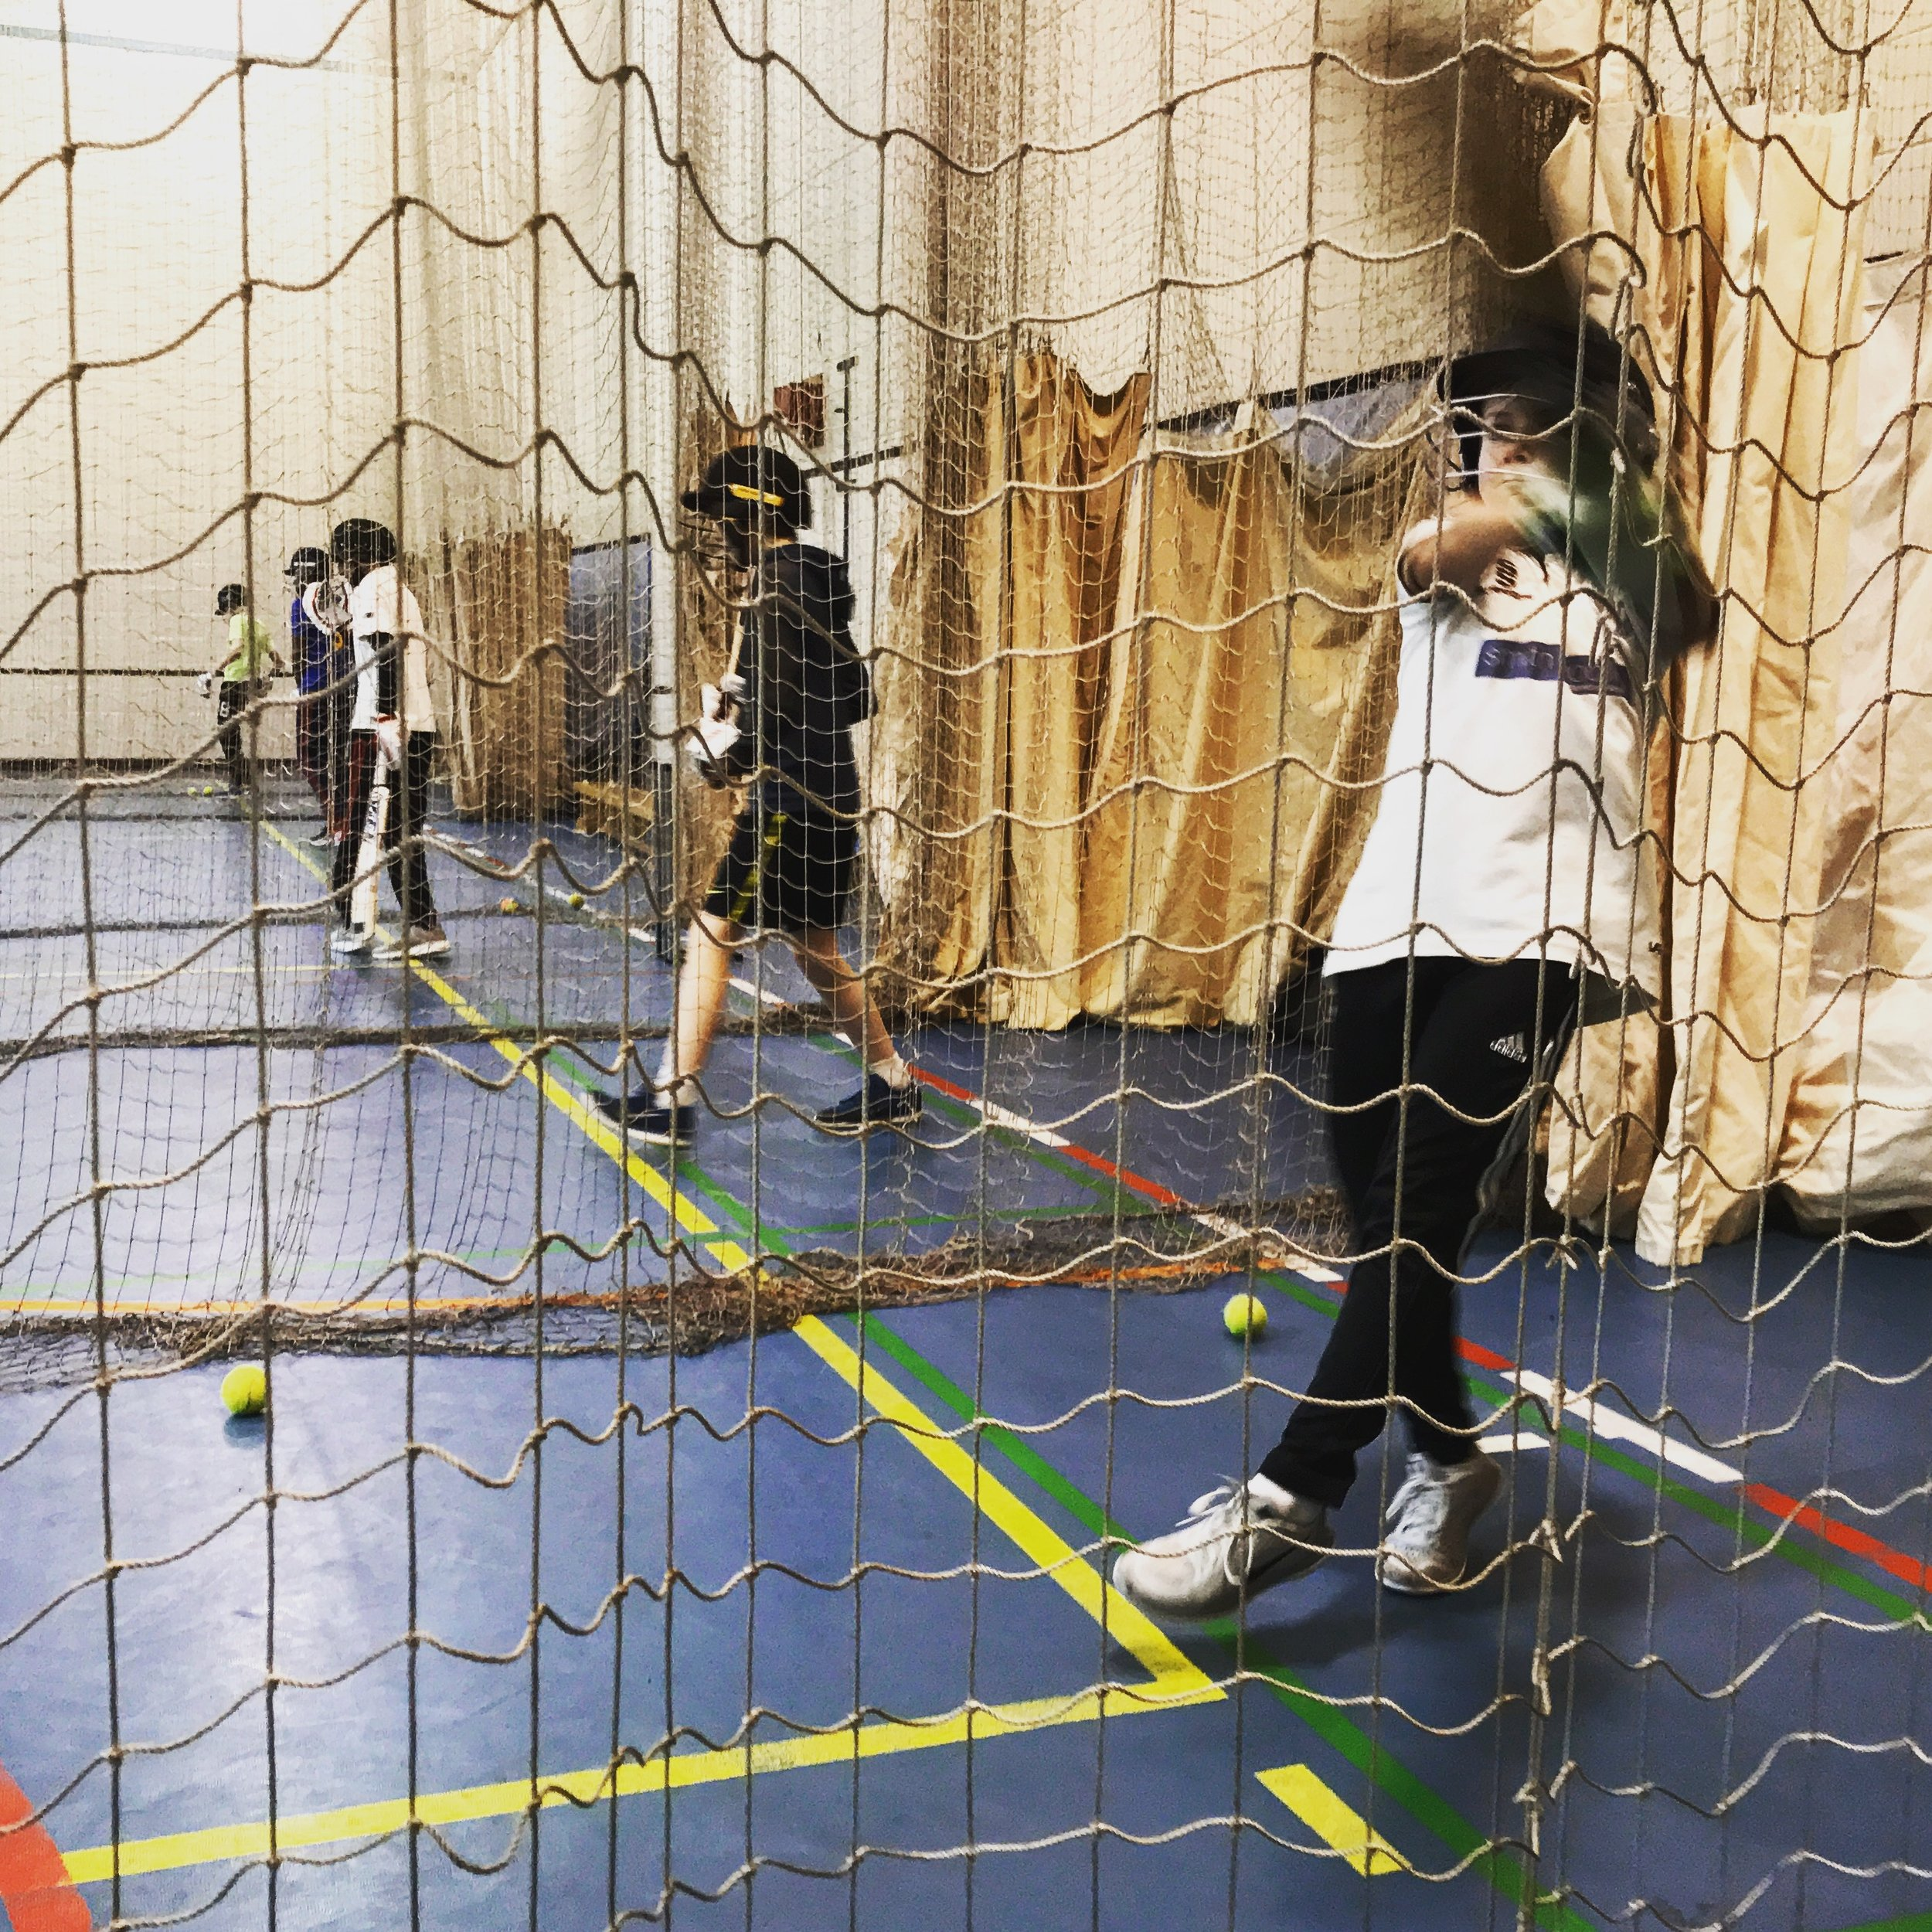 glasgow-cricket-coaching.jpg